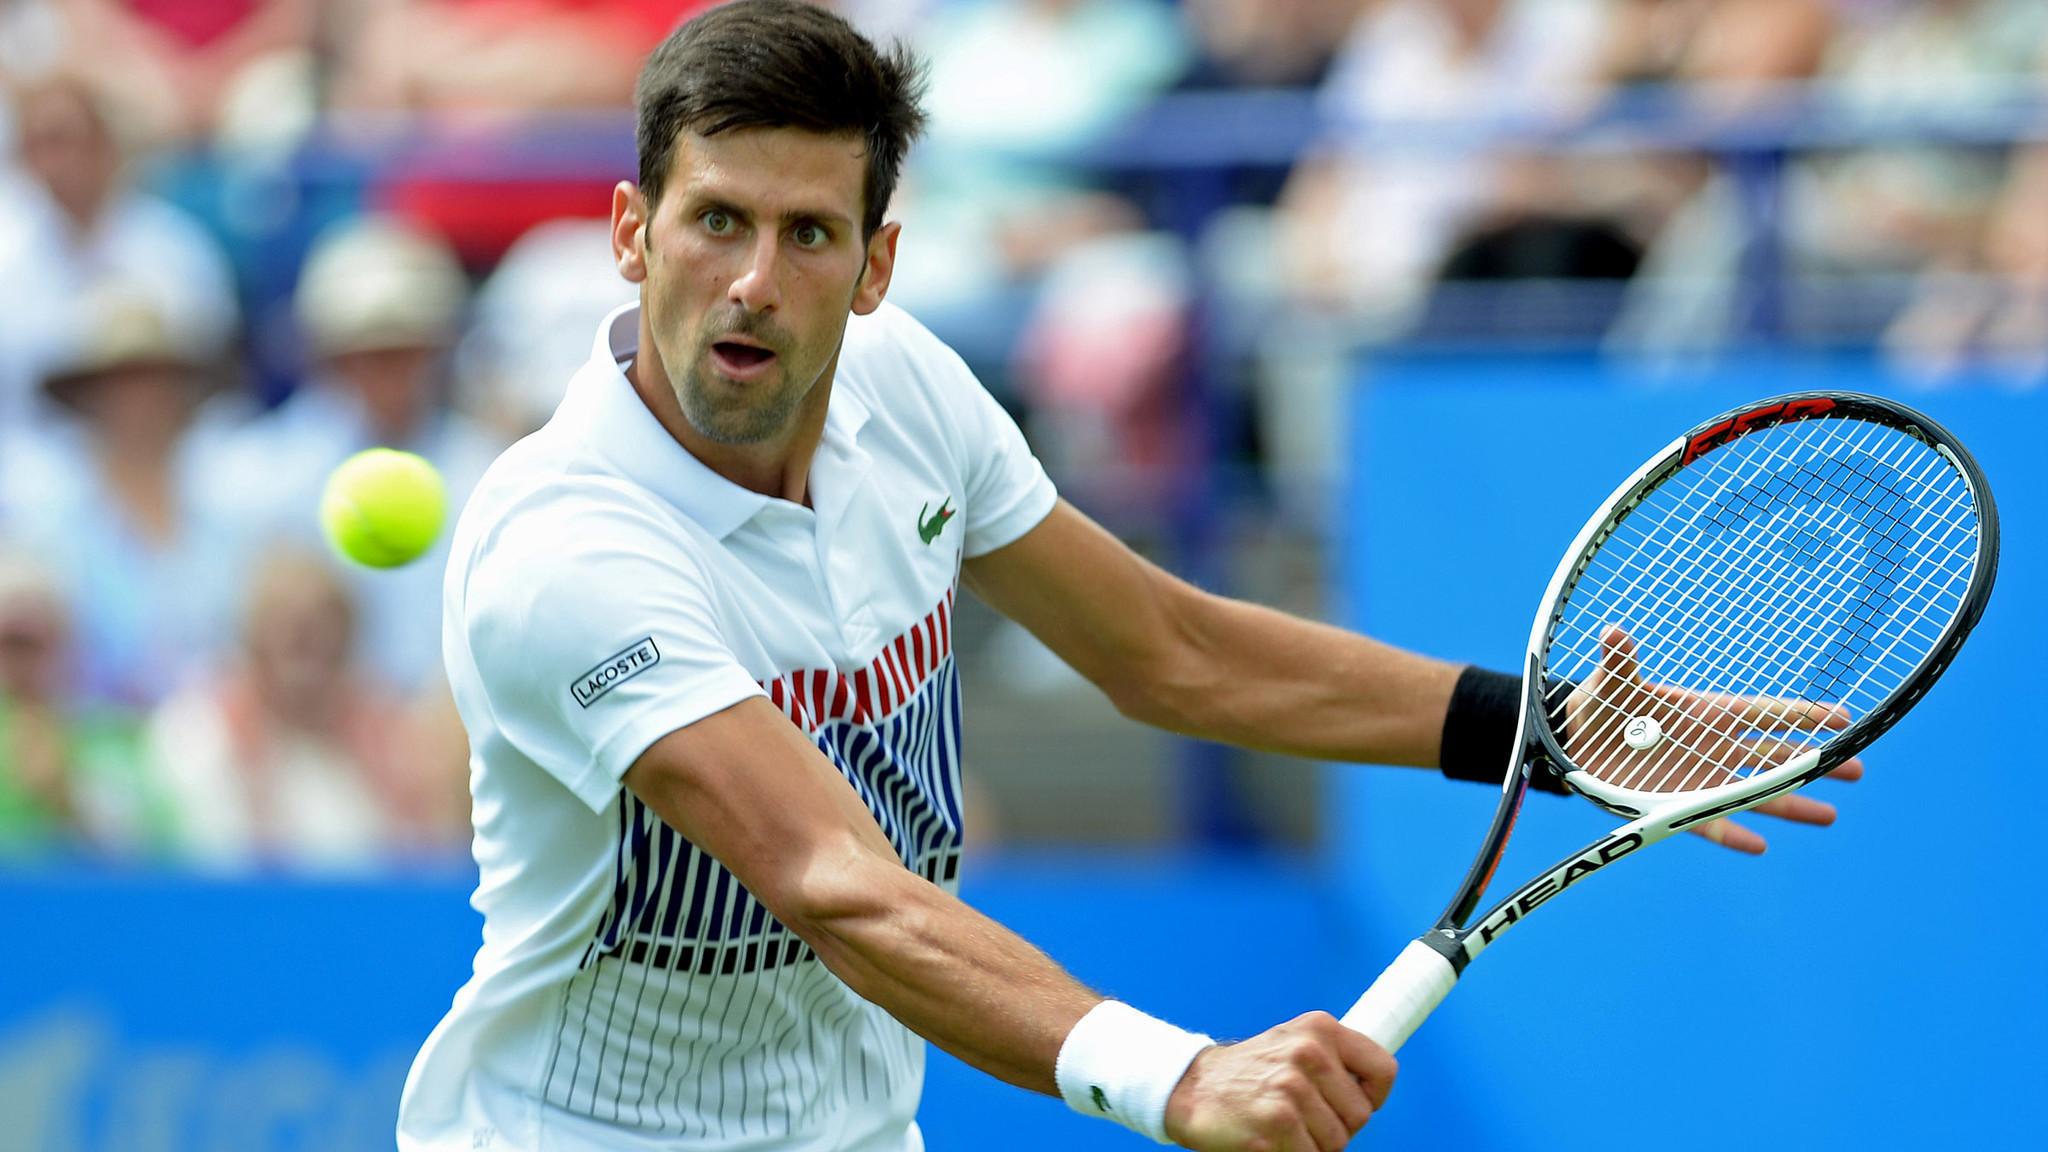 Wimbledon 2019: Novak Djokovic relies on mental strength ...  |Djokovic